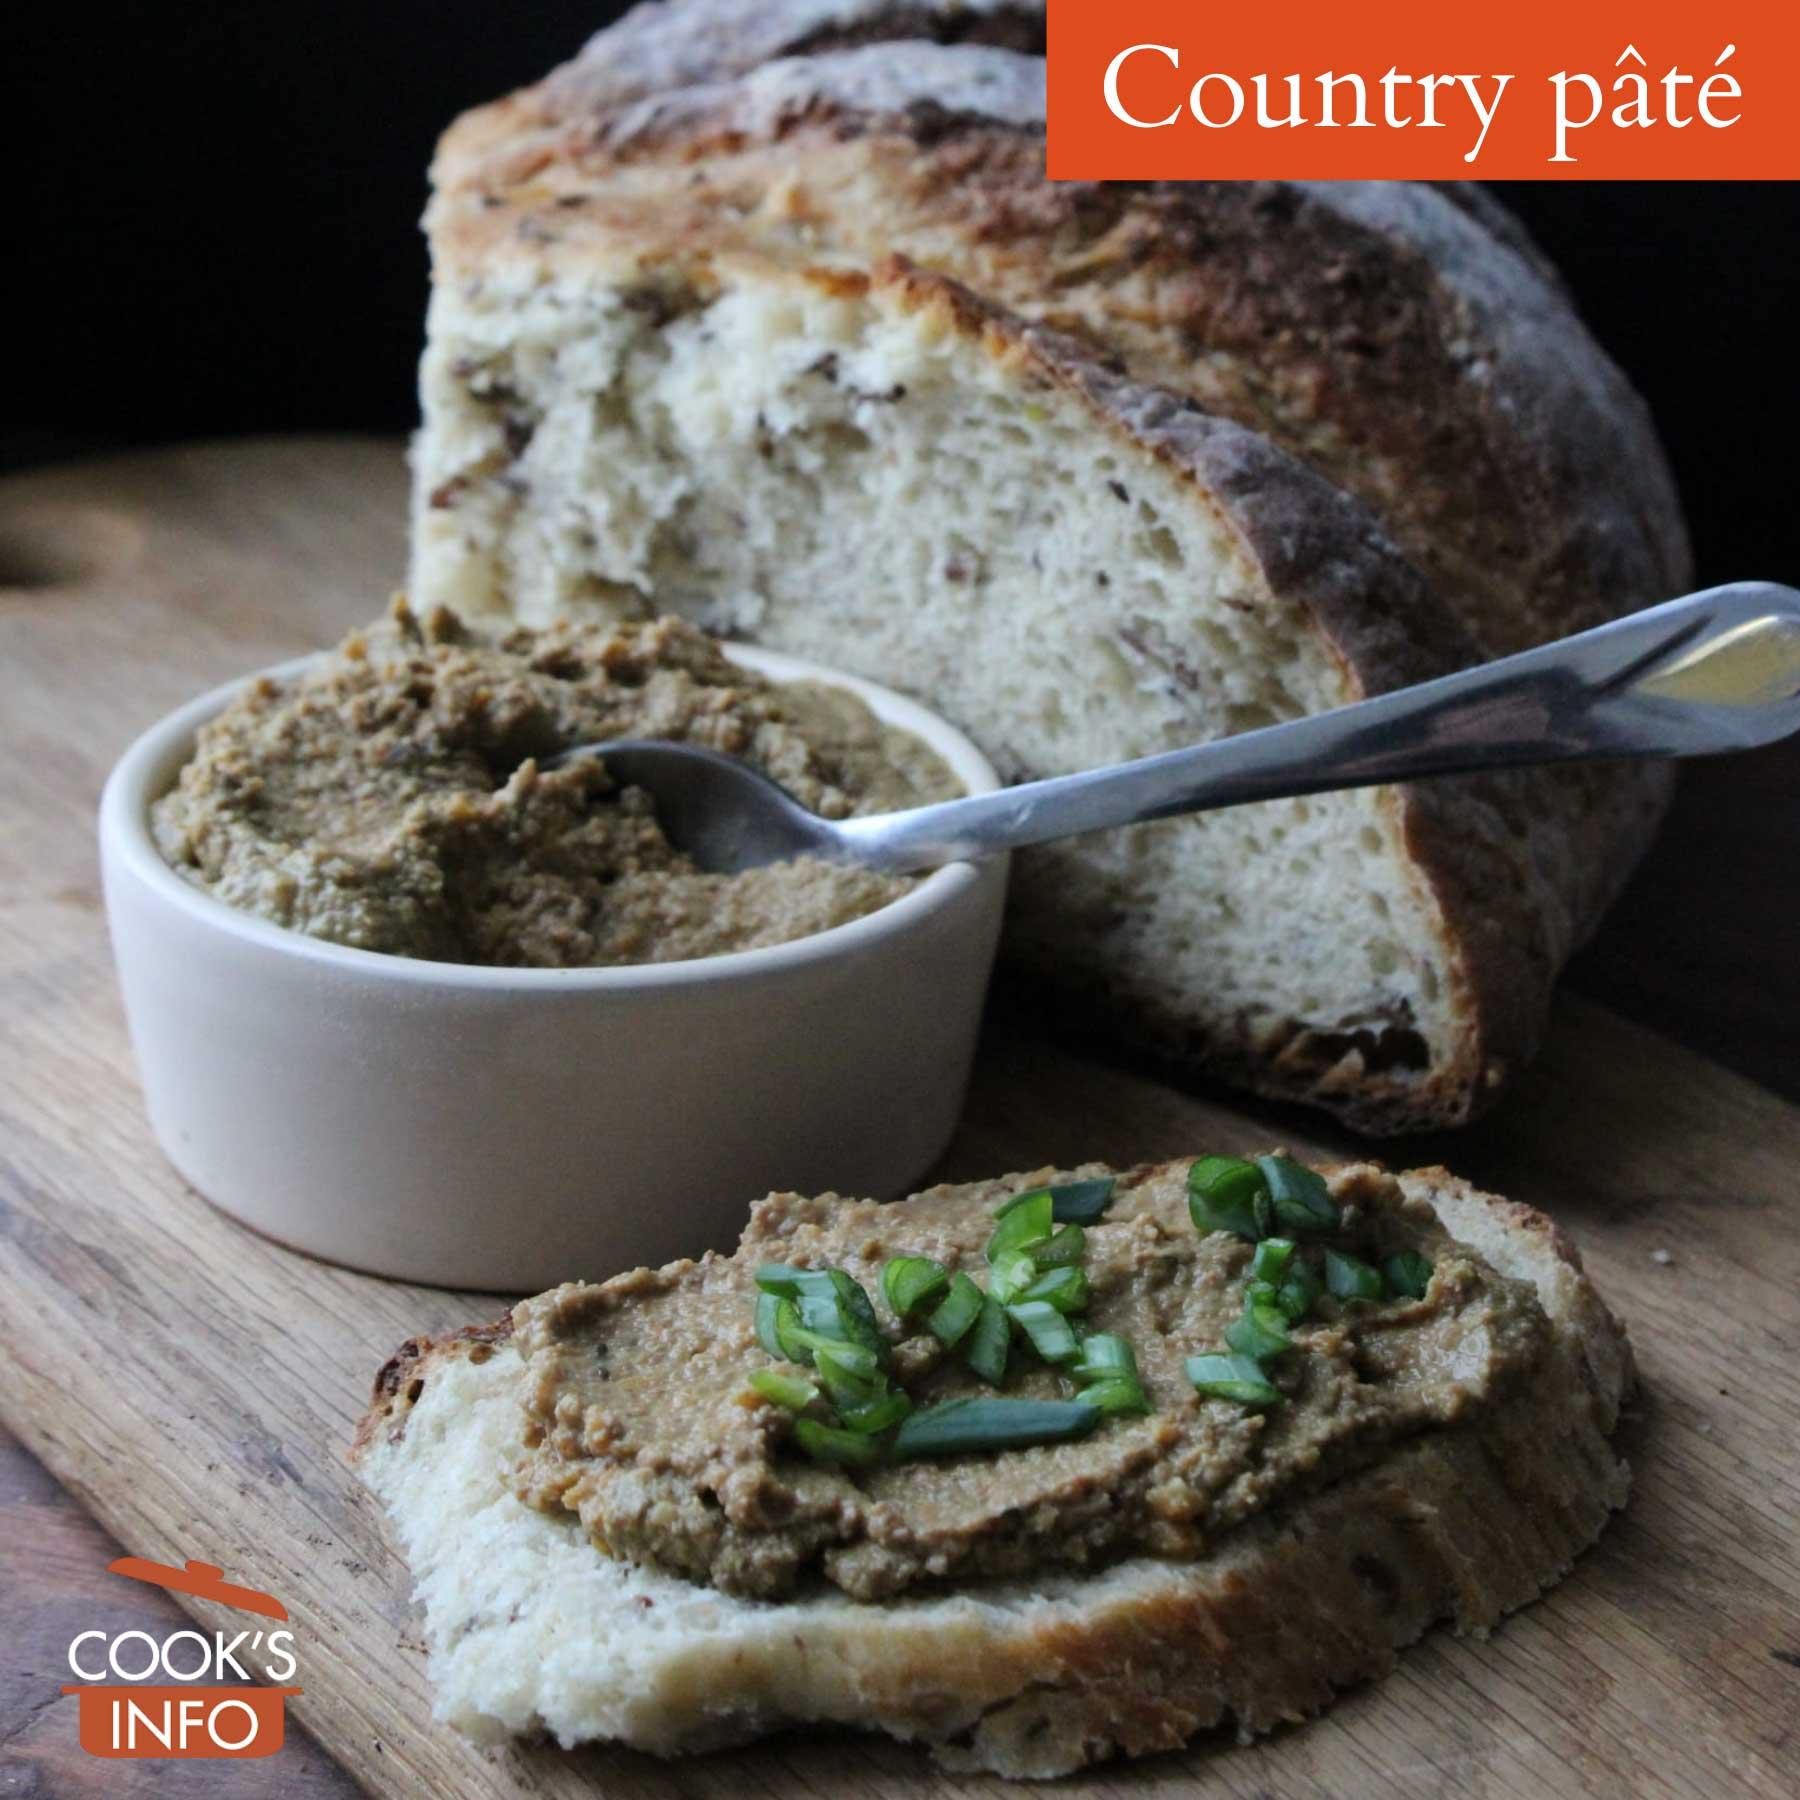 Country pâté